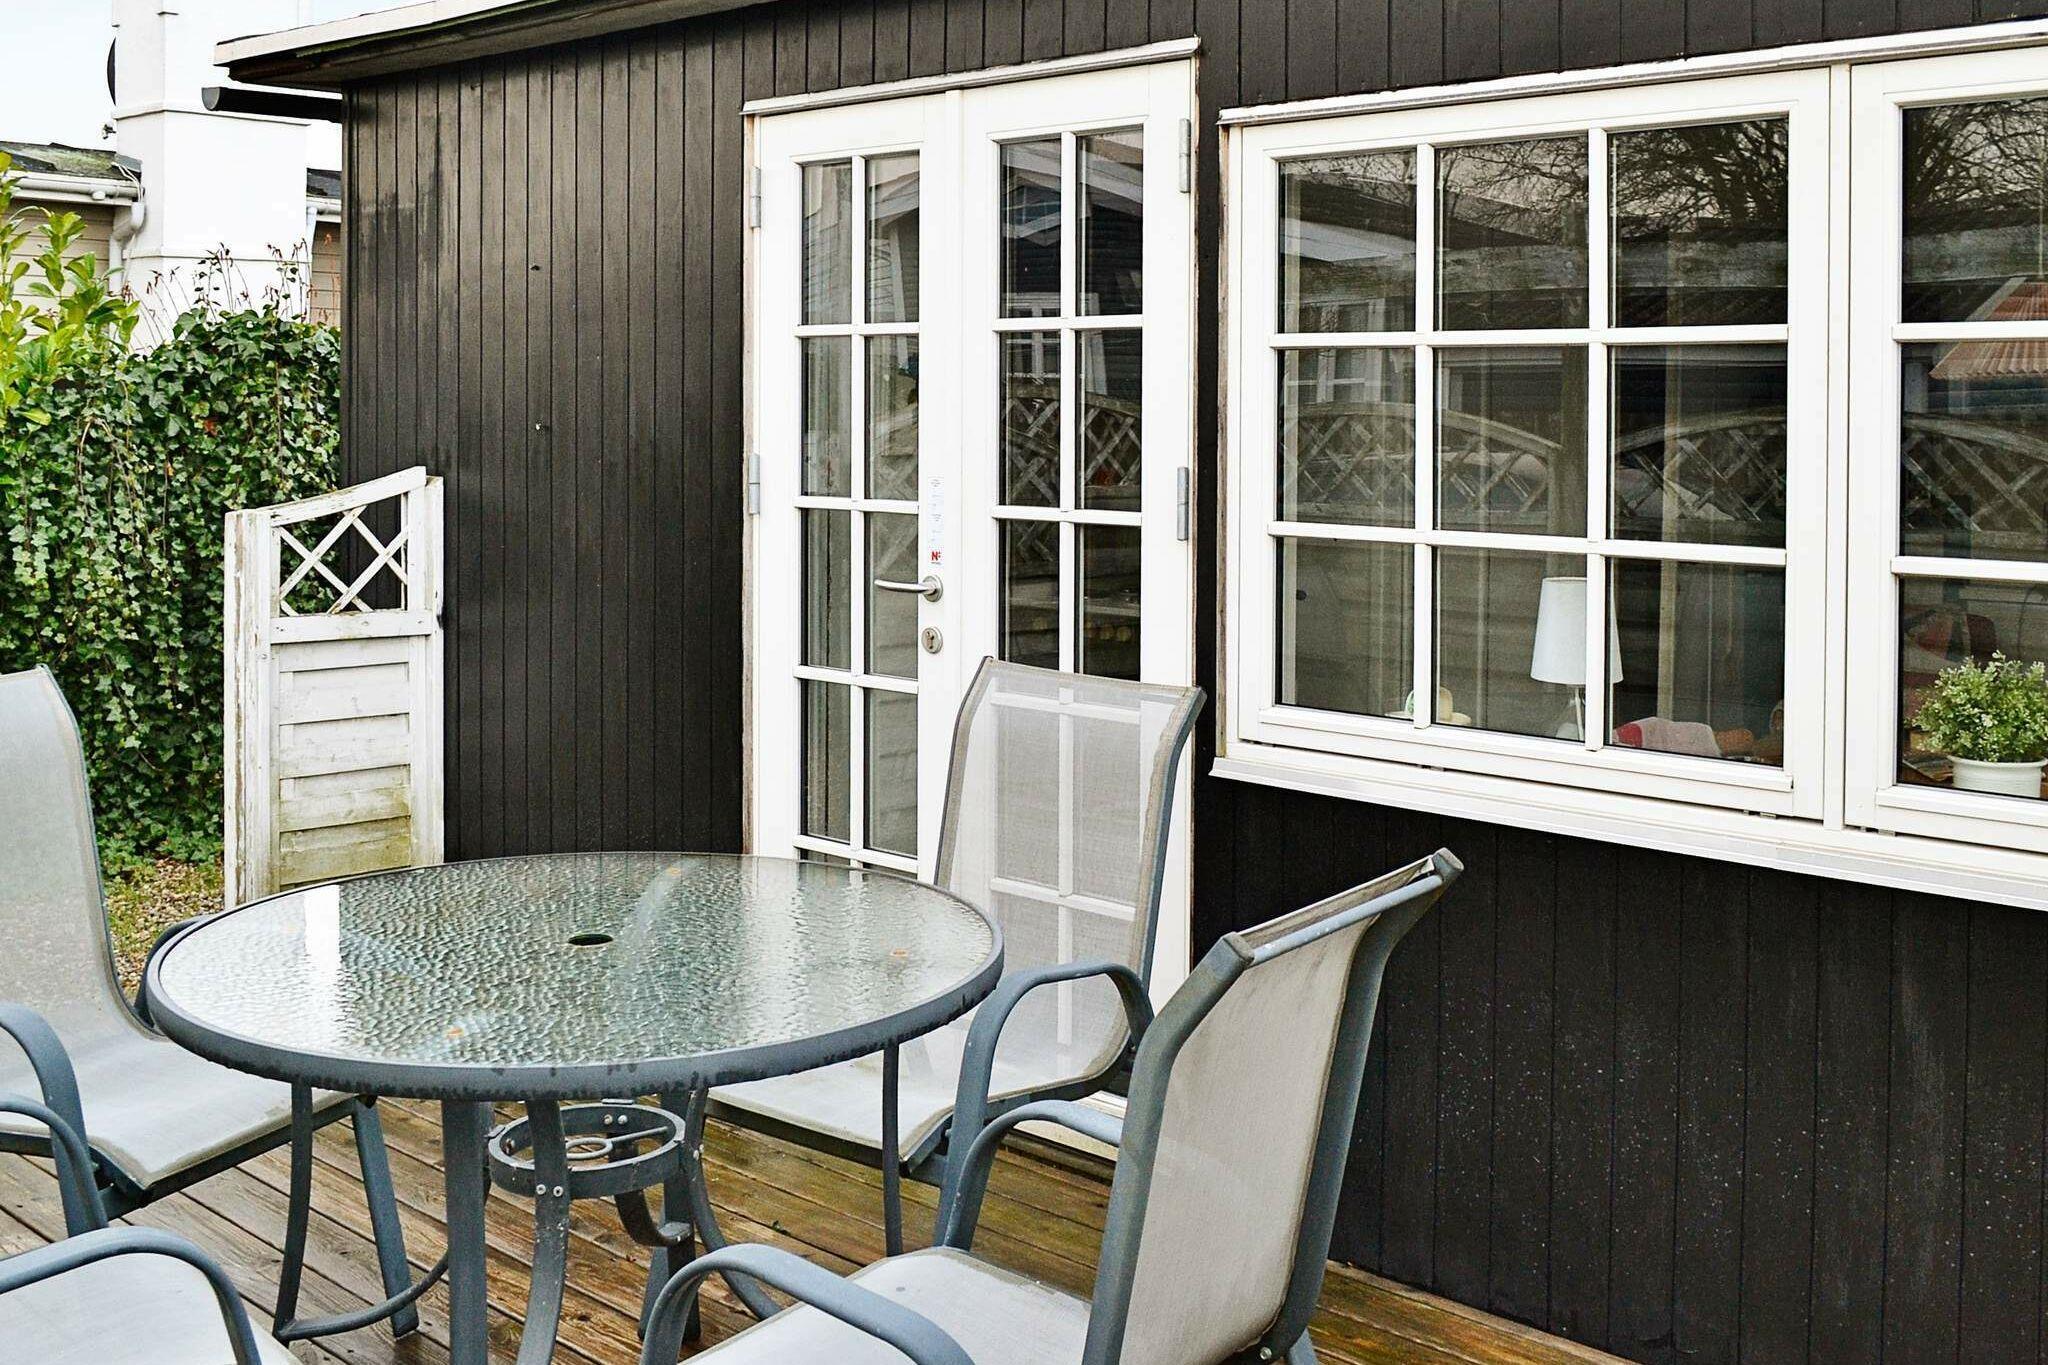 Sommerhus til 2 personer ved Otterup